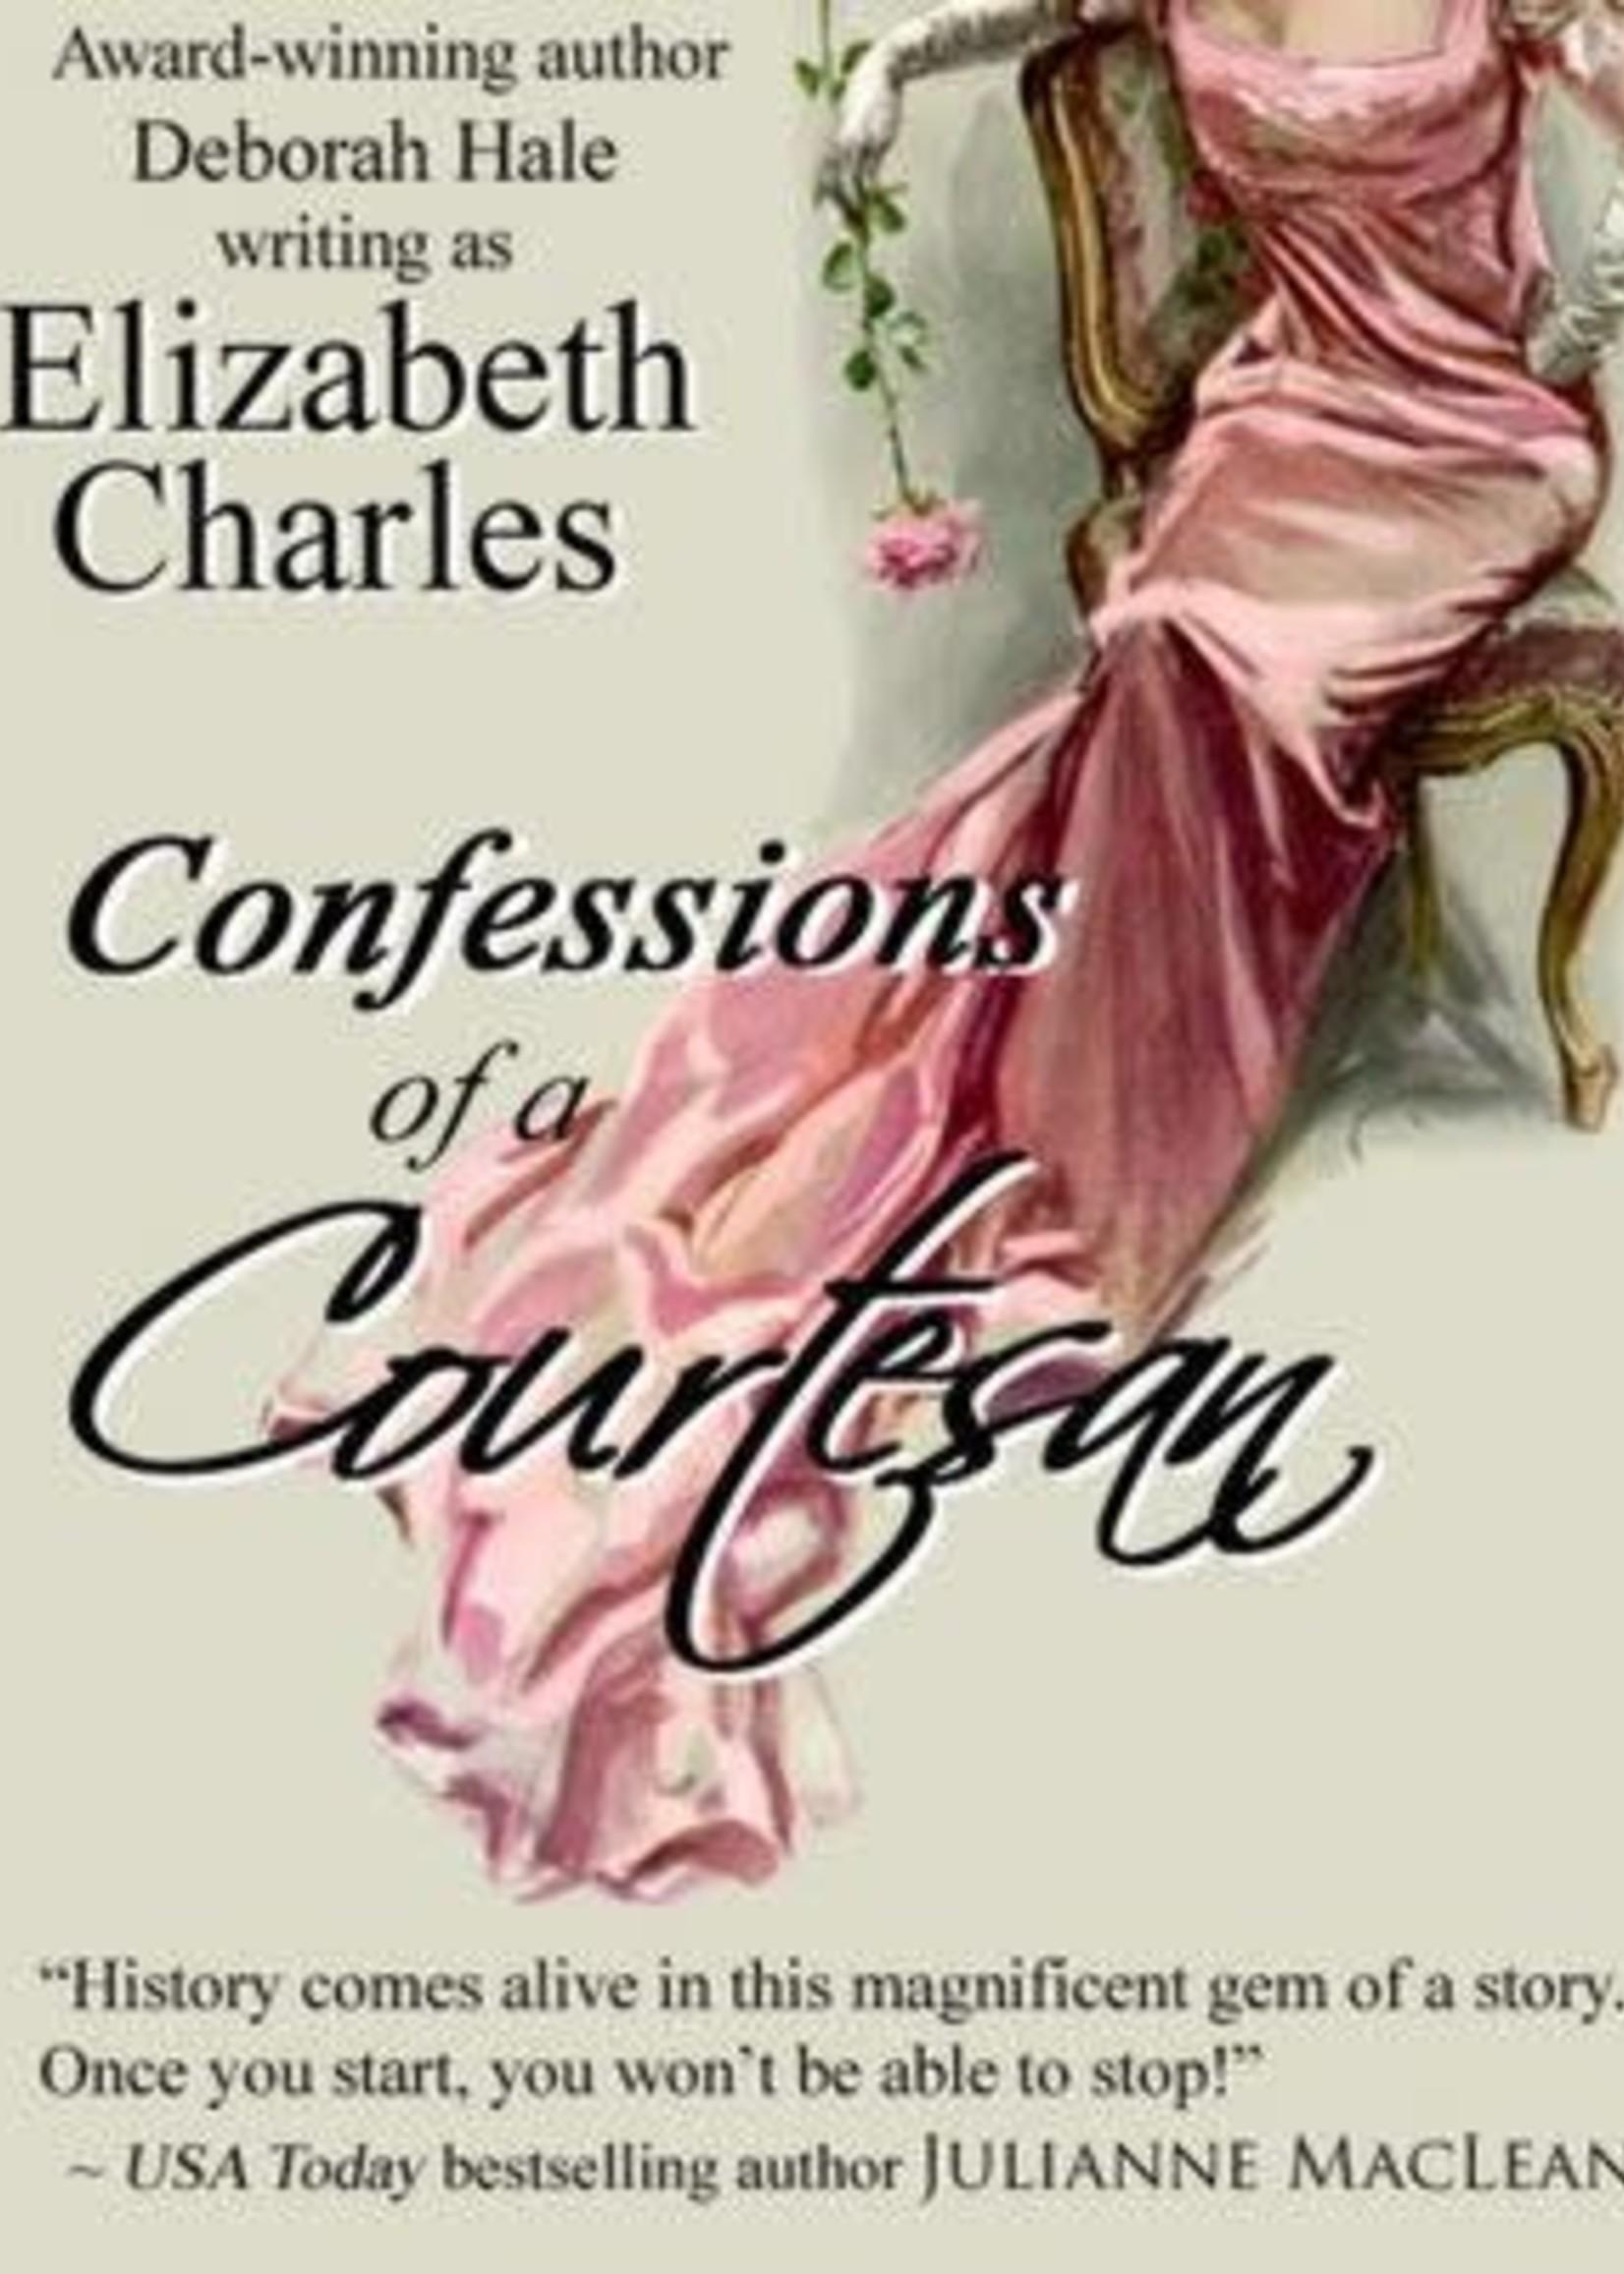 USED - Confessions of a Courtesan by Deborah Hale